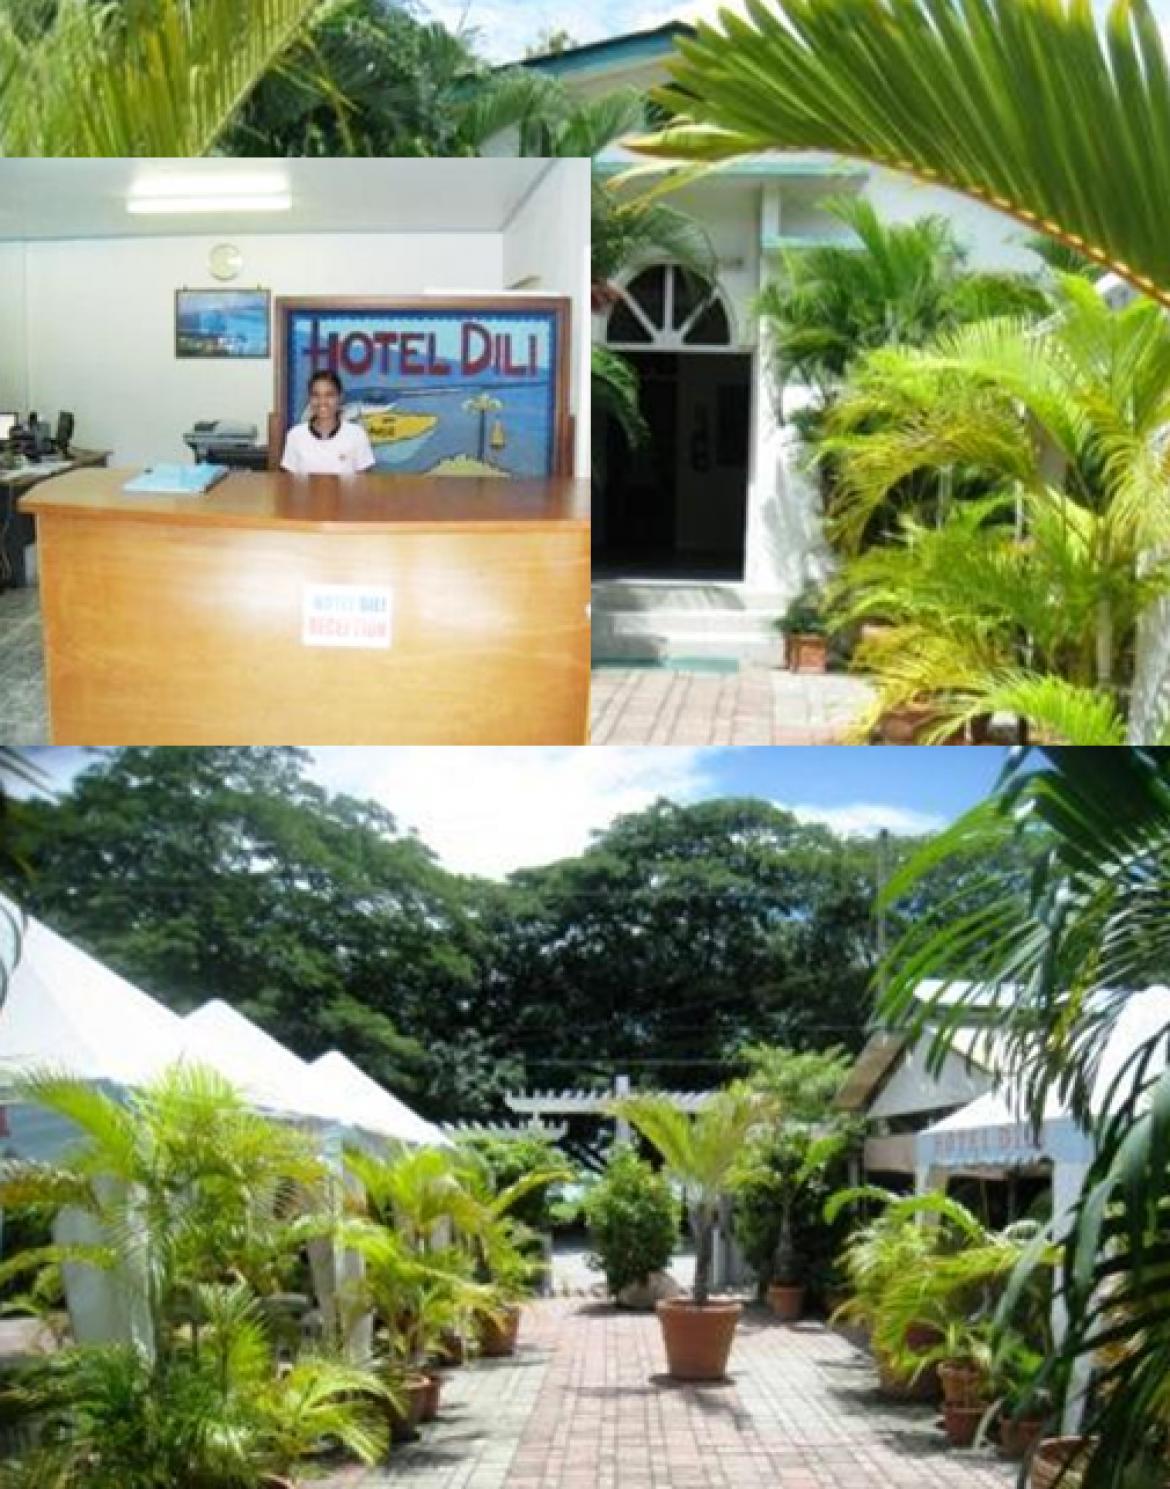 Hotel Dili Lda Timor-Leste